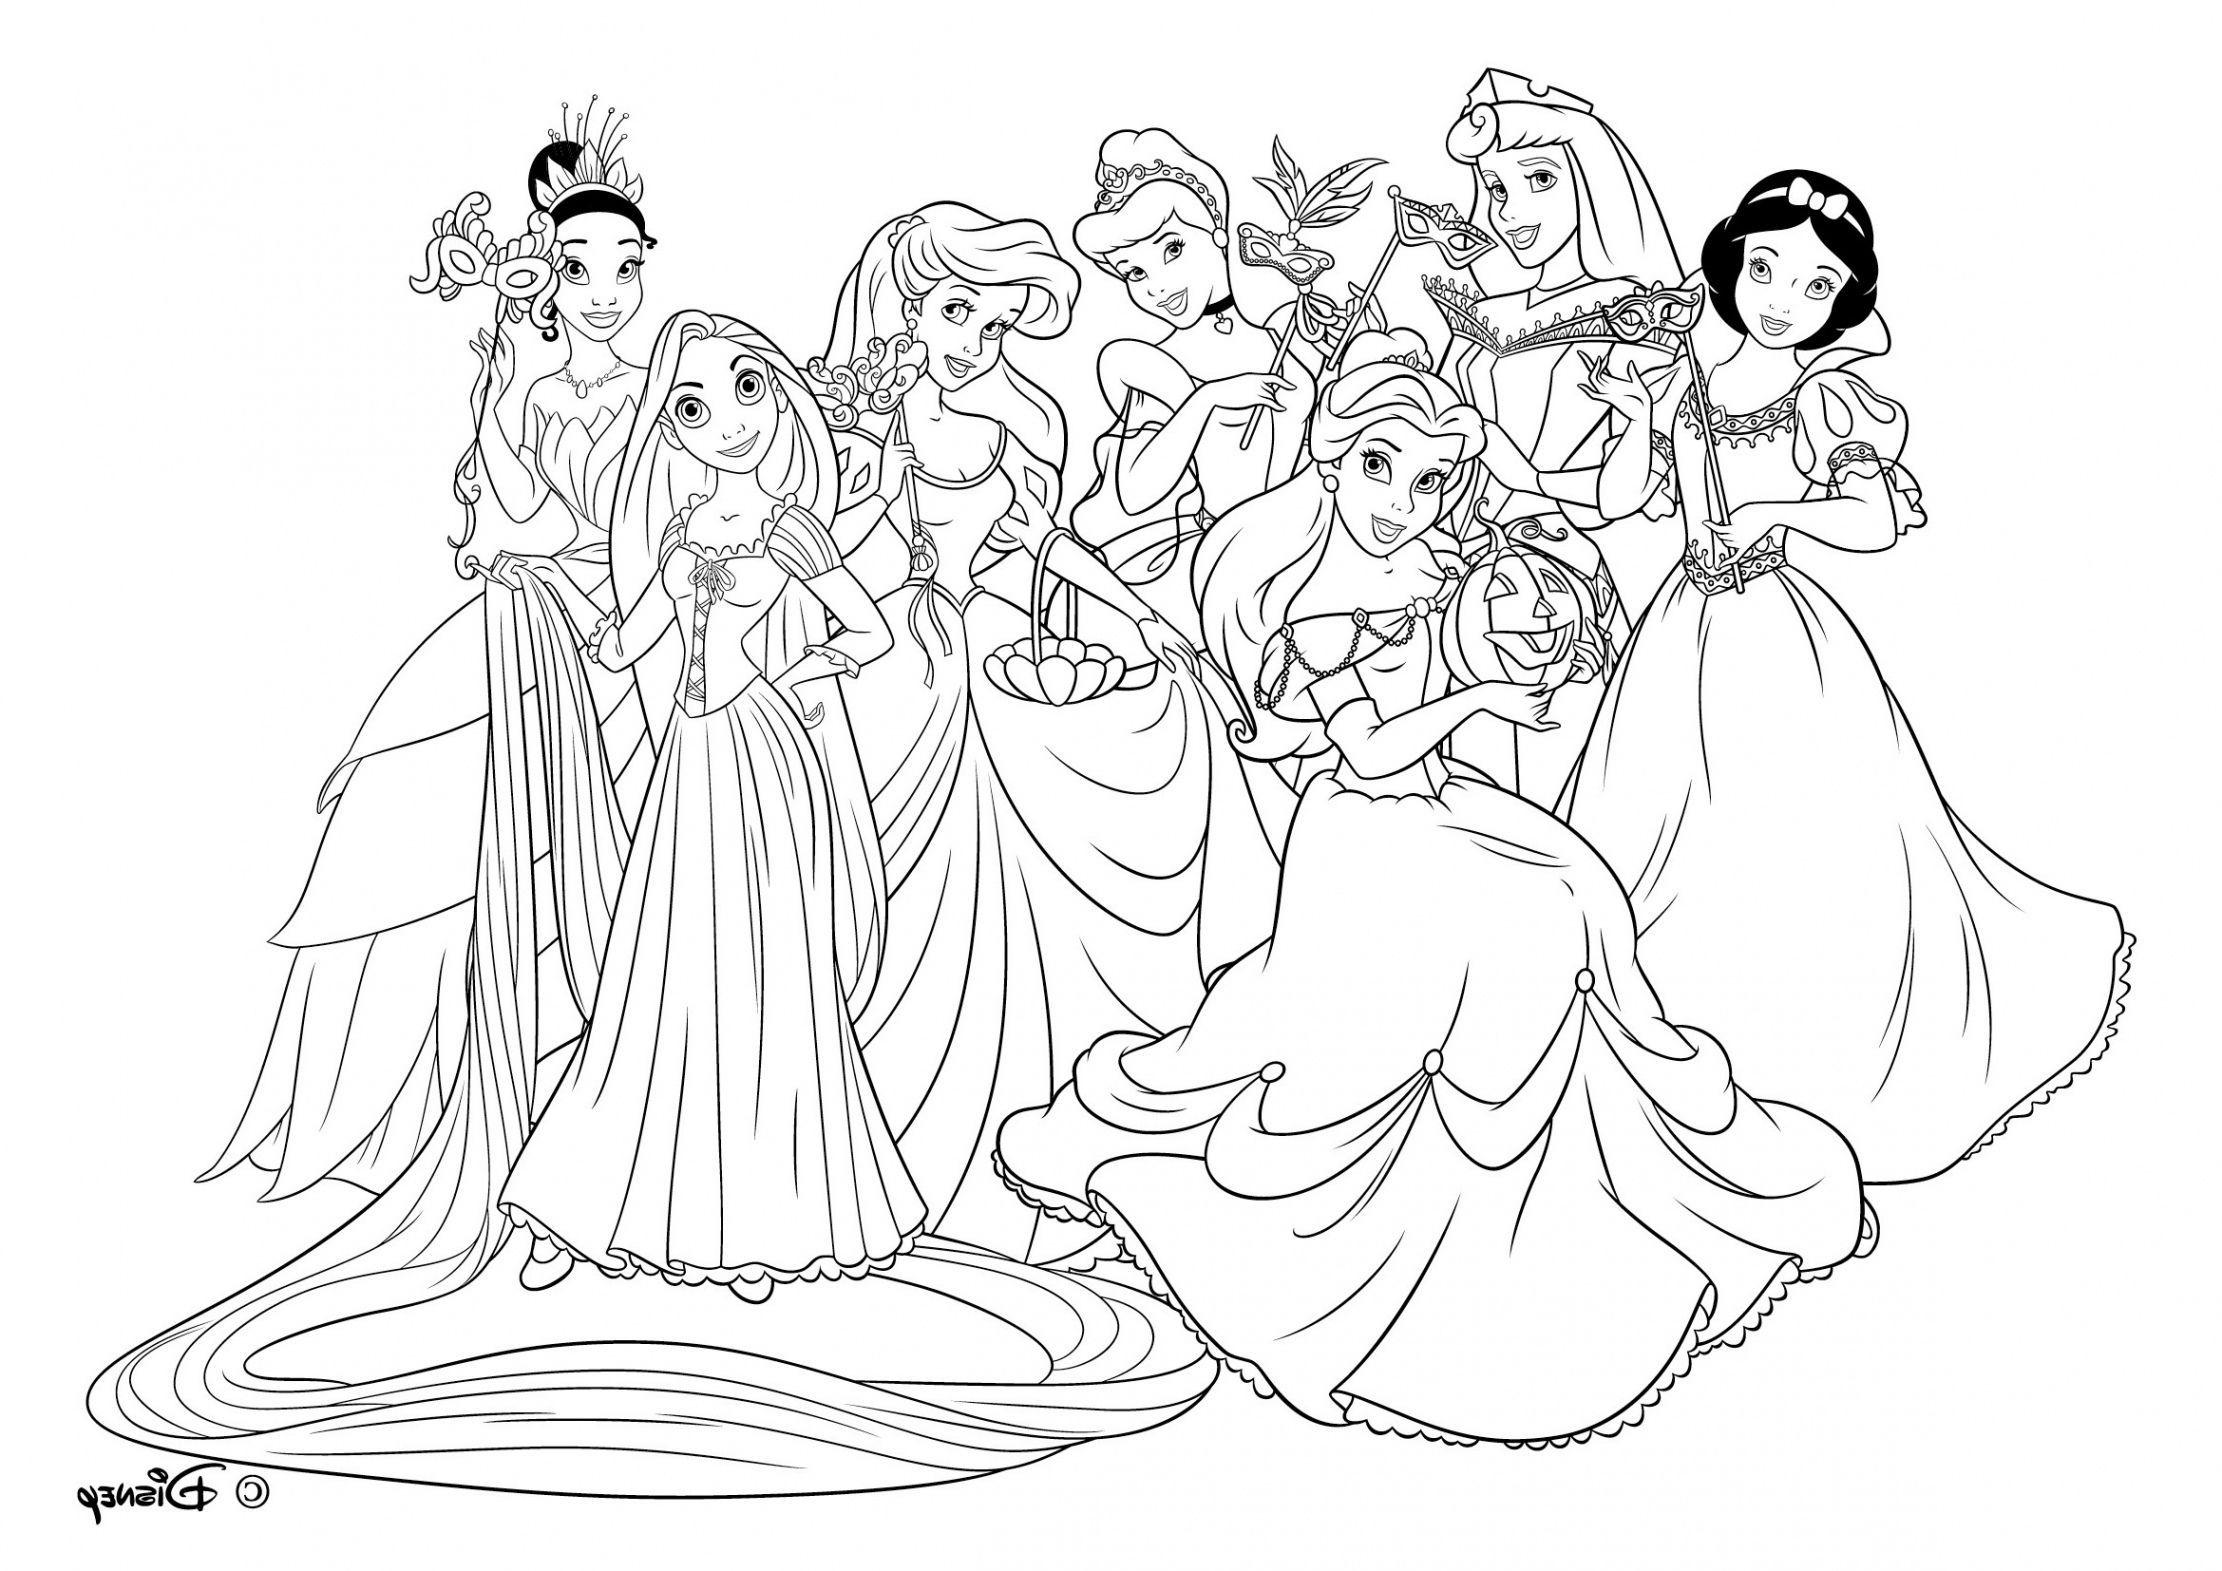 Disney Coloriage - KBACHA.COM | KBACHA.COM Coloriage disney à imprimer in 2020 | Castle coloring ...